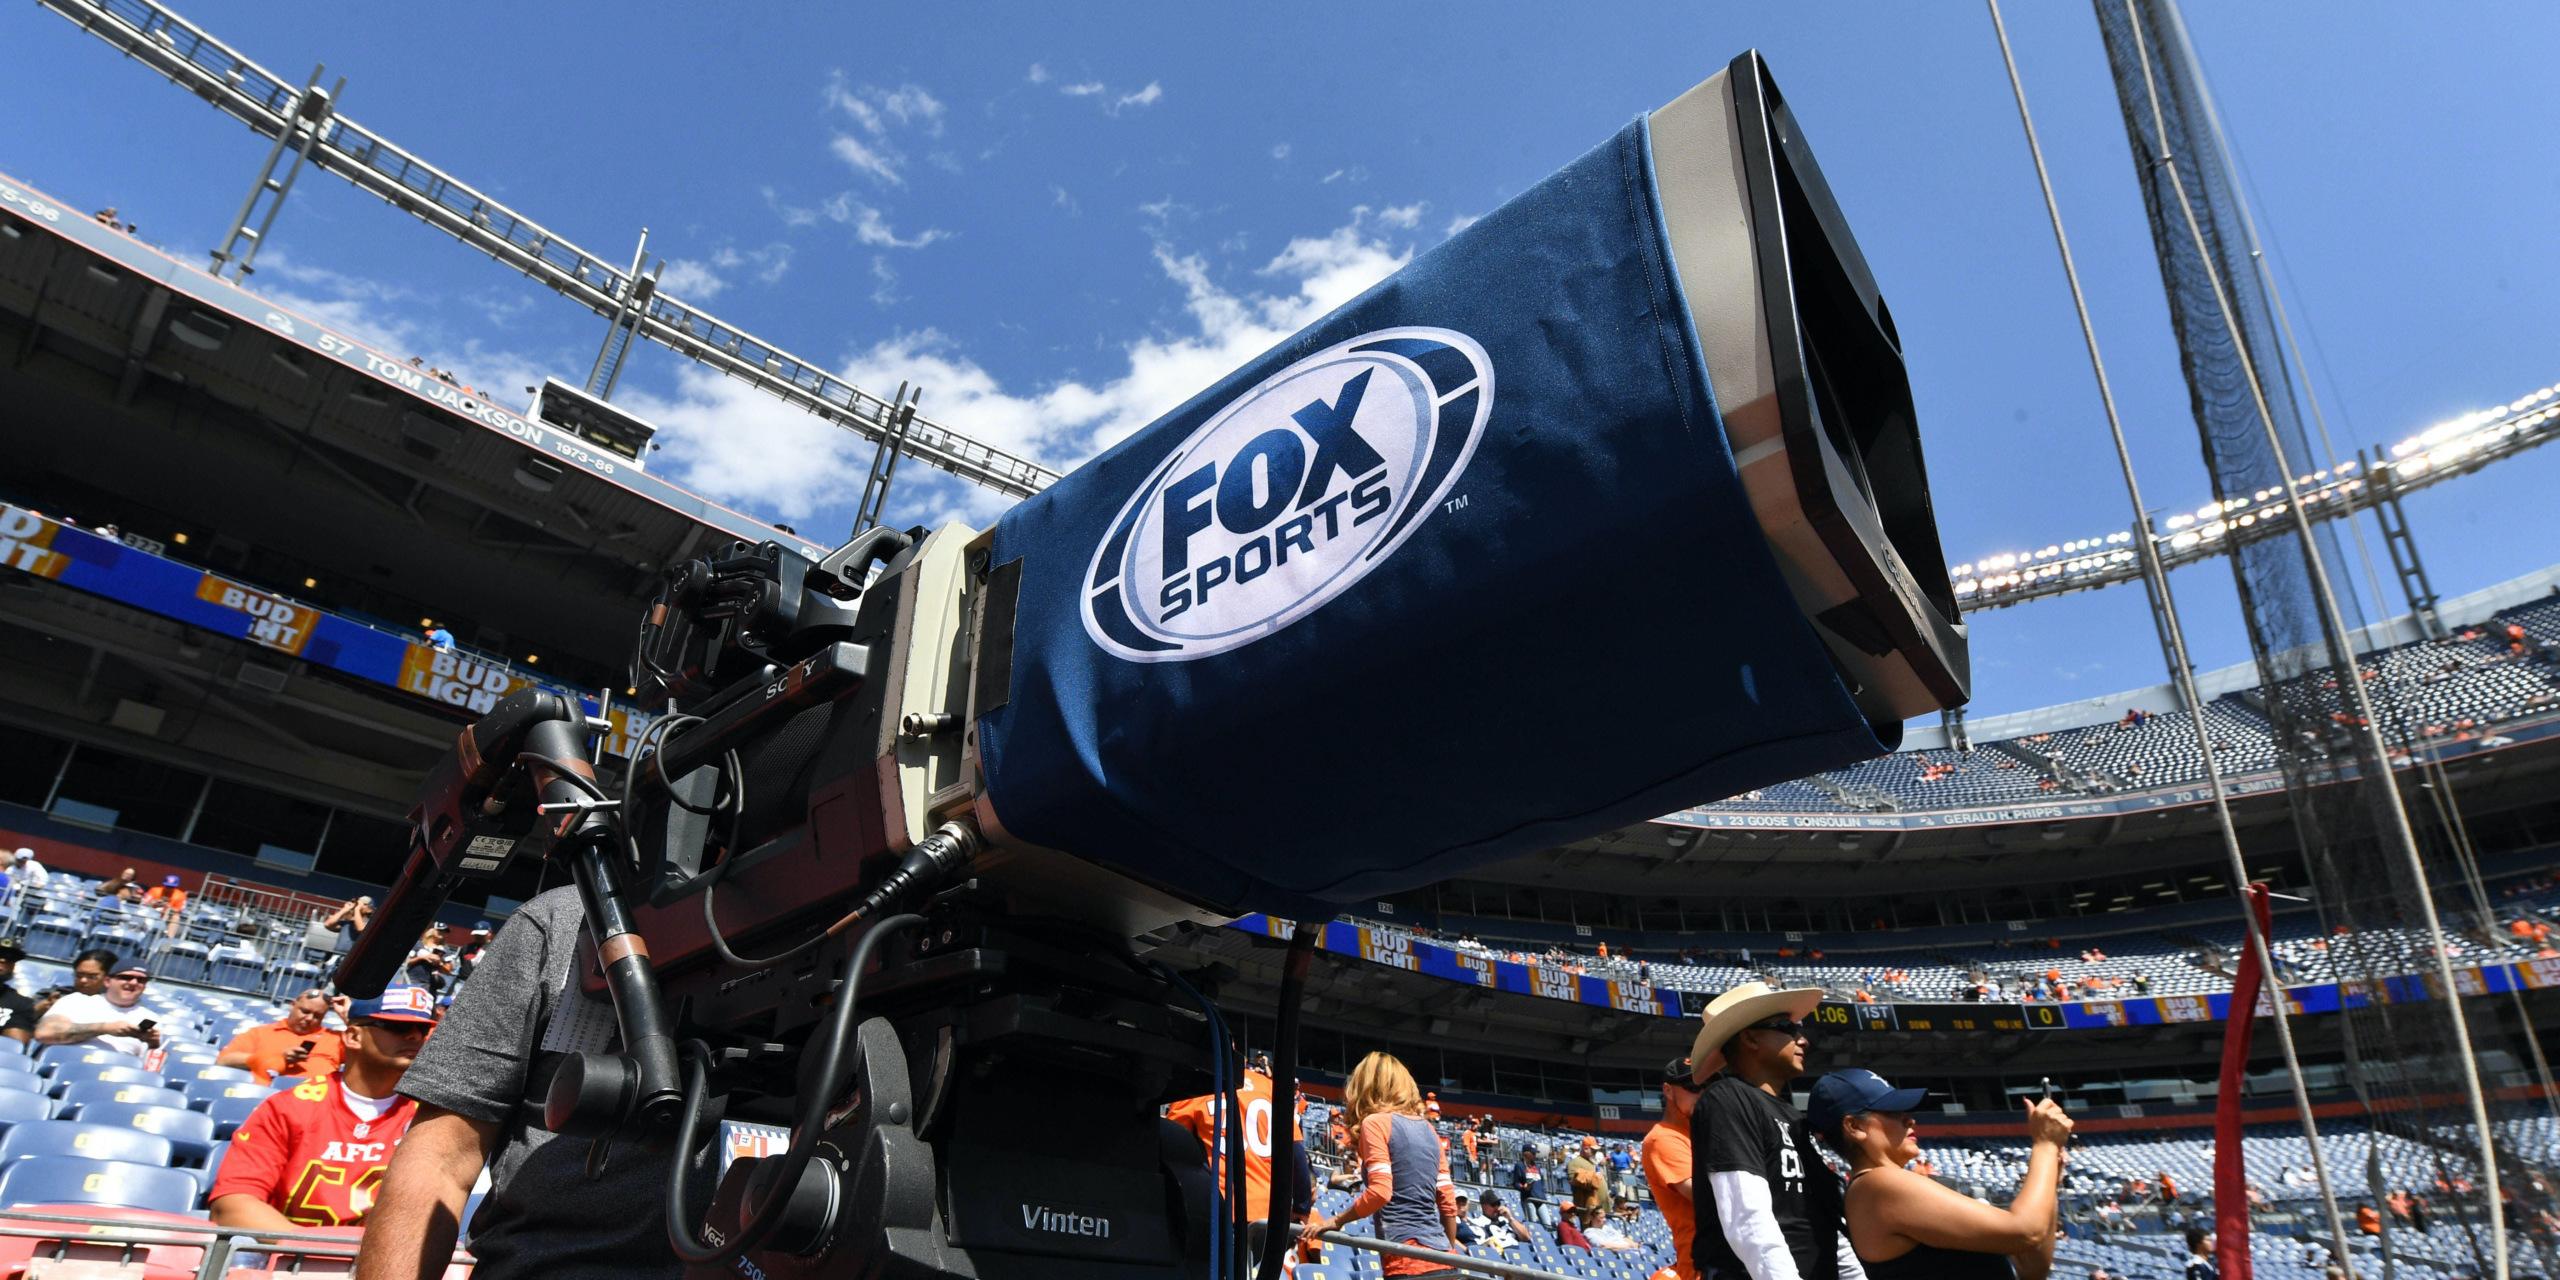 Fox Sports Camera